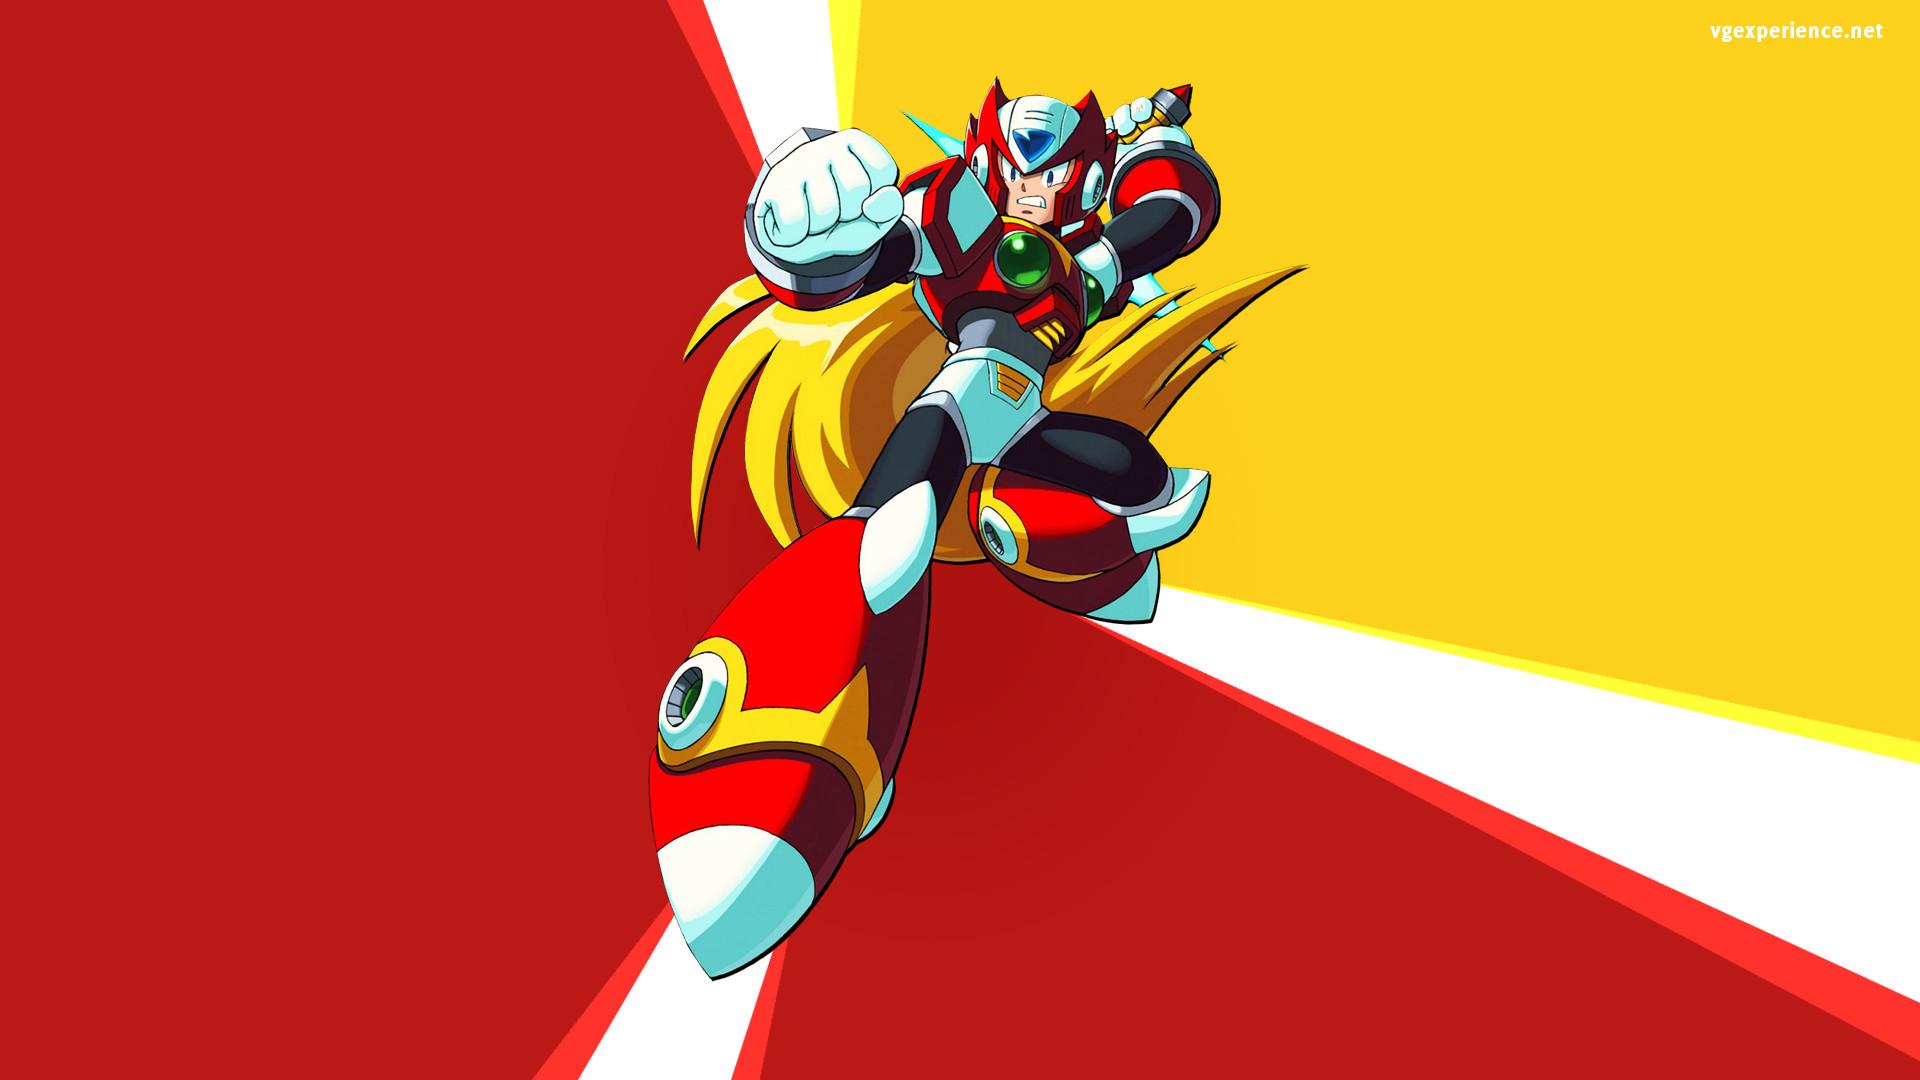 Mega Man X Computer Wallpapers, Desktop Backgrounds .